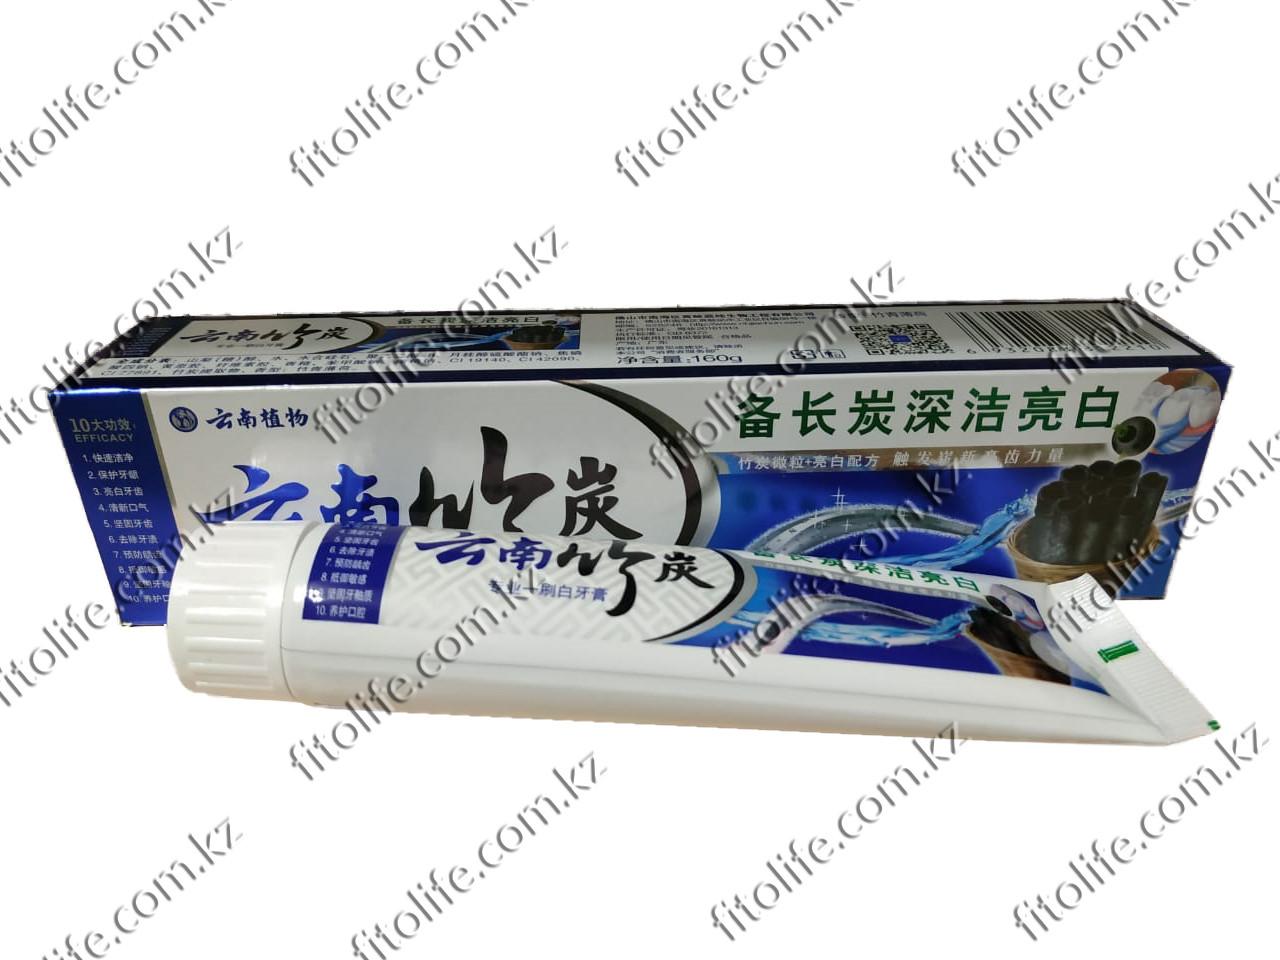 Зубная паста на основе бамбукового угля